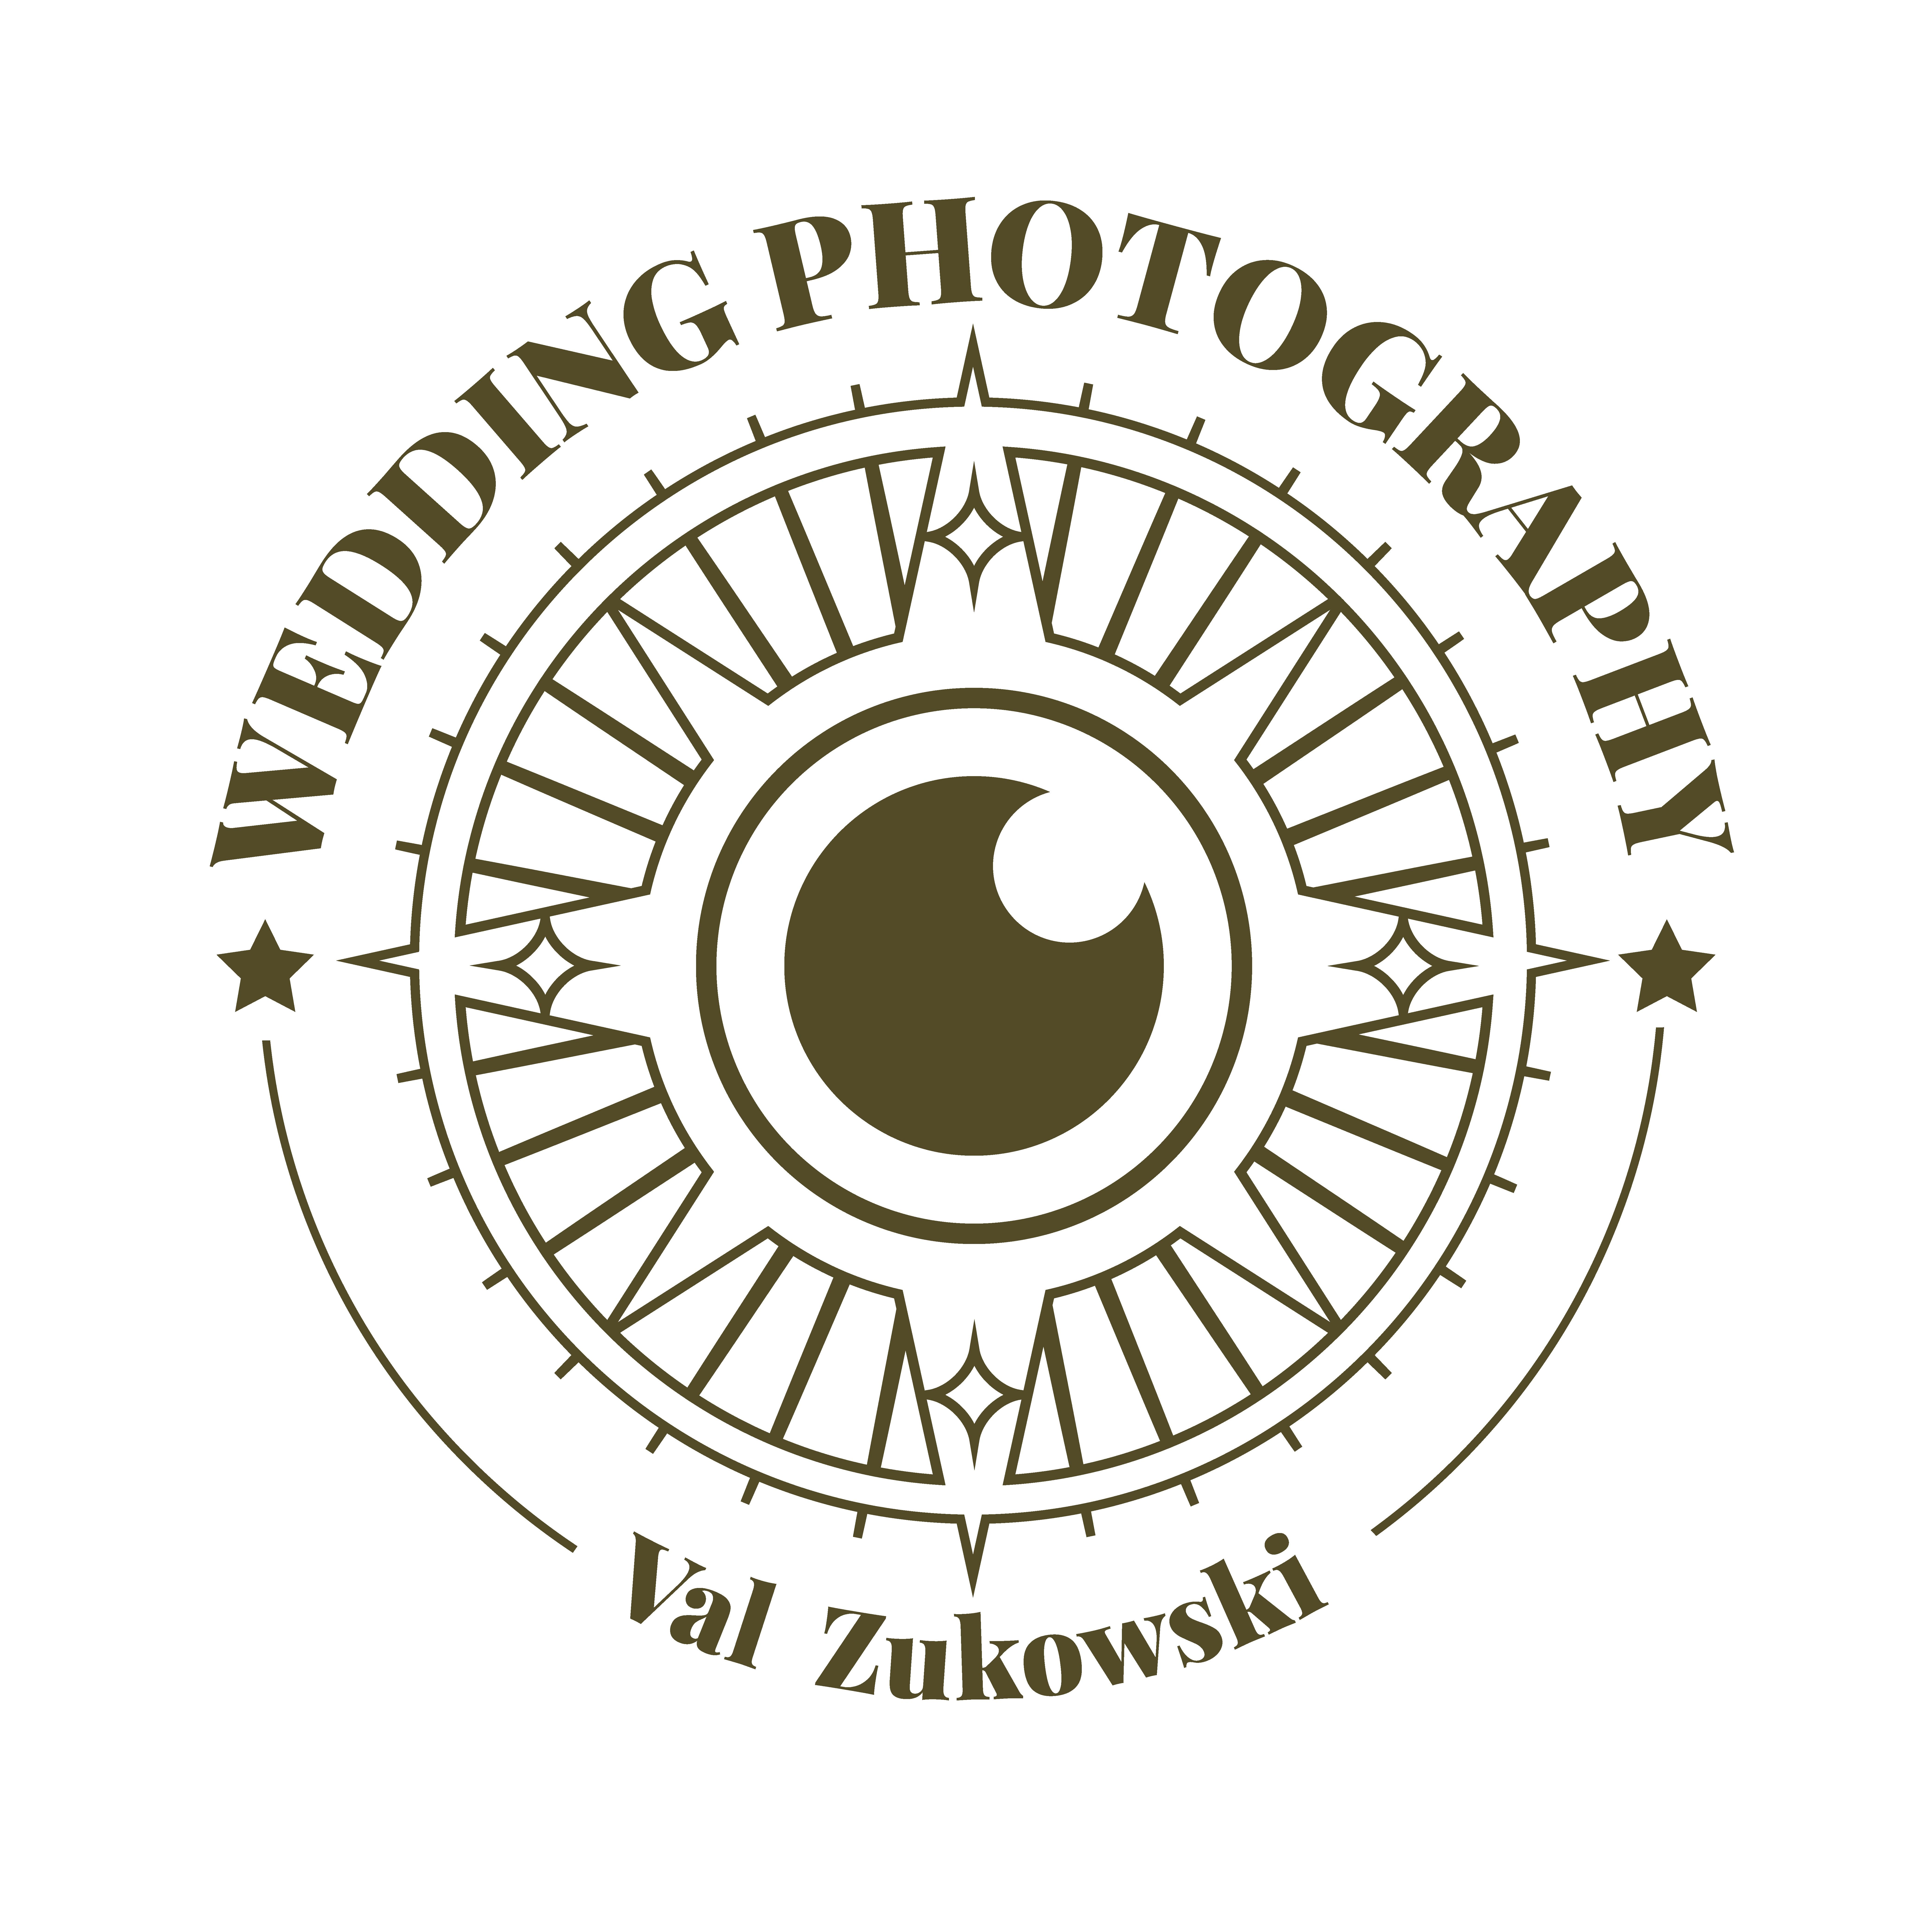 Destination Wedding Photography, Val Zukowski - Wedding Photographer Ireland